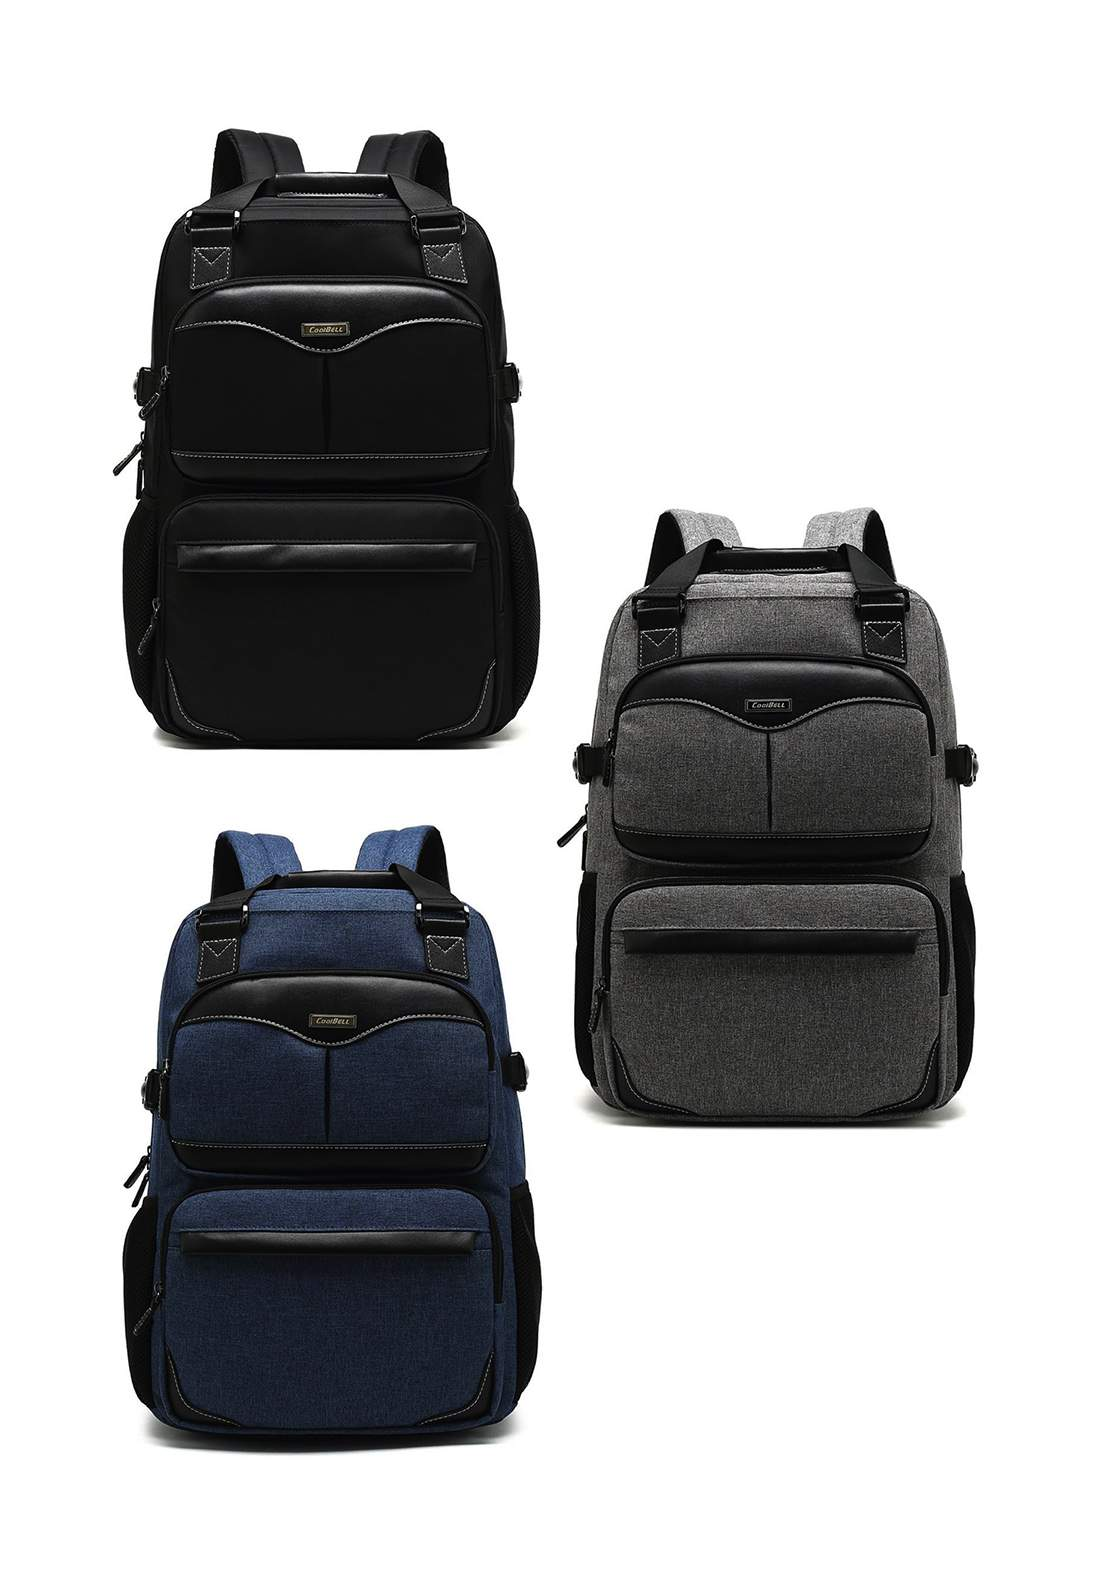 Coolbell CB-8017 Nylon Backpack حقيبة ظهر